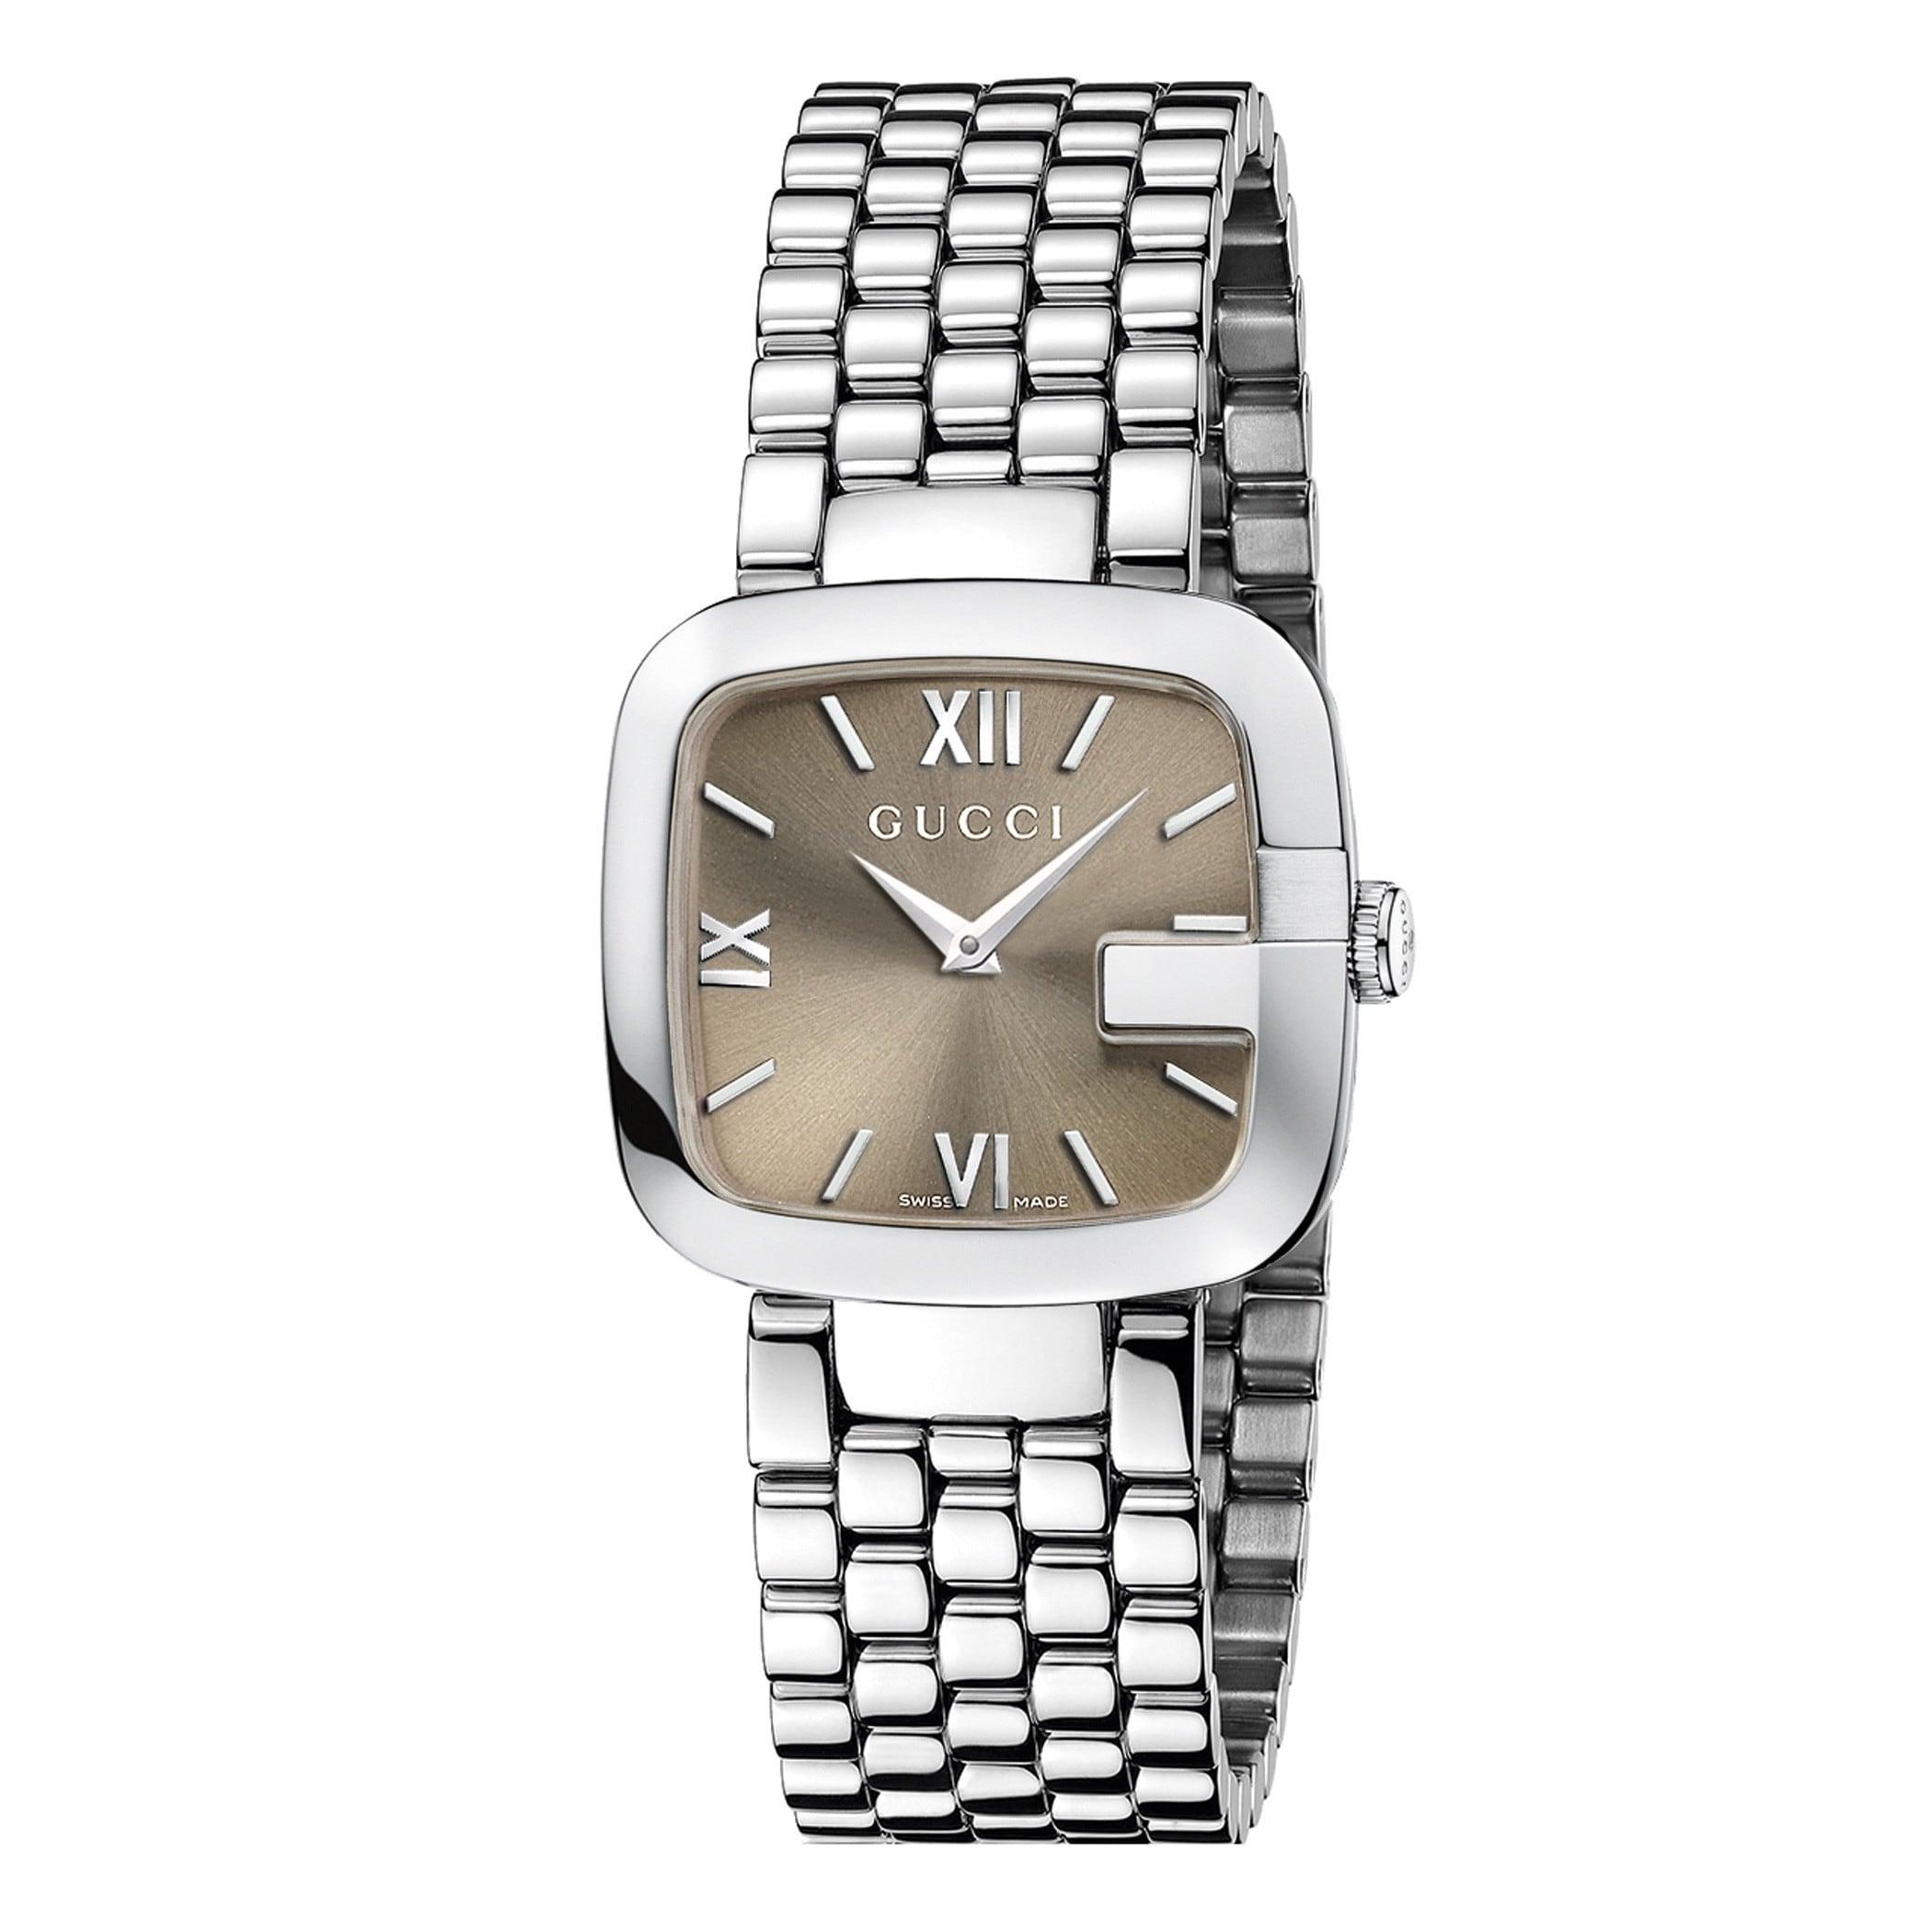 dfec3cf648c Shop Gucci Women s  G-Gucci  Recognizable G-Case Watch - Free ...